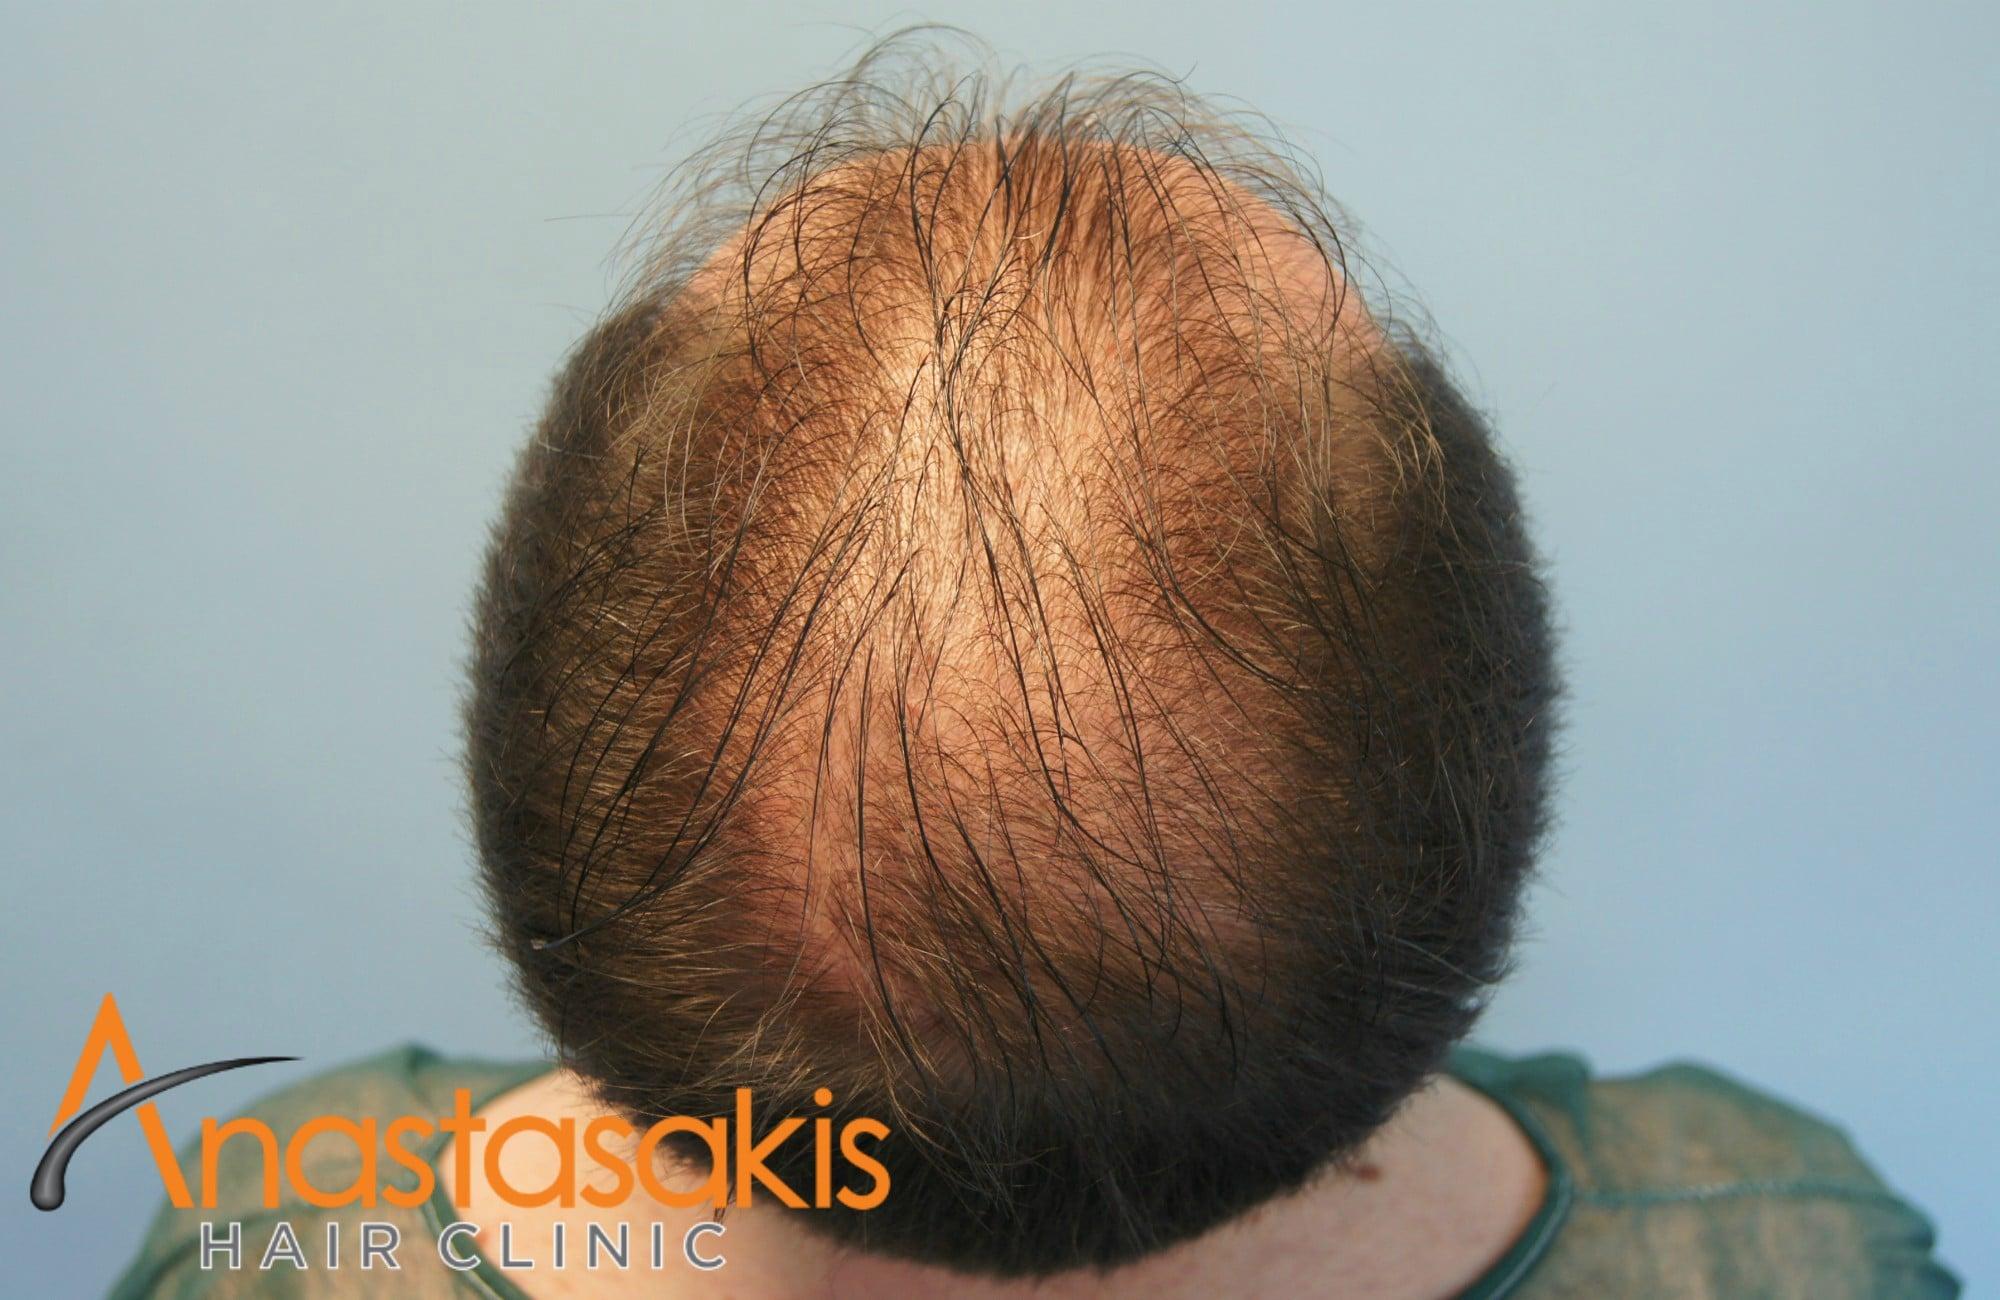 birdview ασθενους πριν τη μεταμοσχευση μαλλιων με fue με 1700 fus